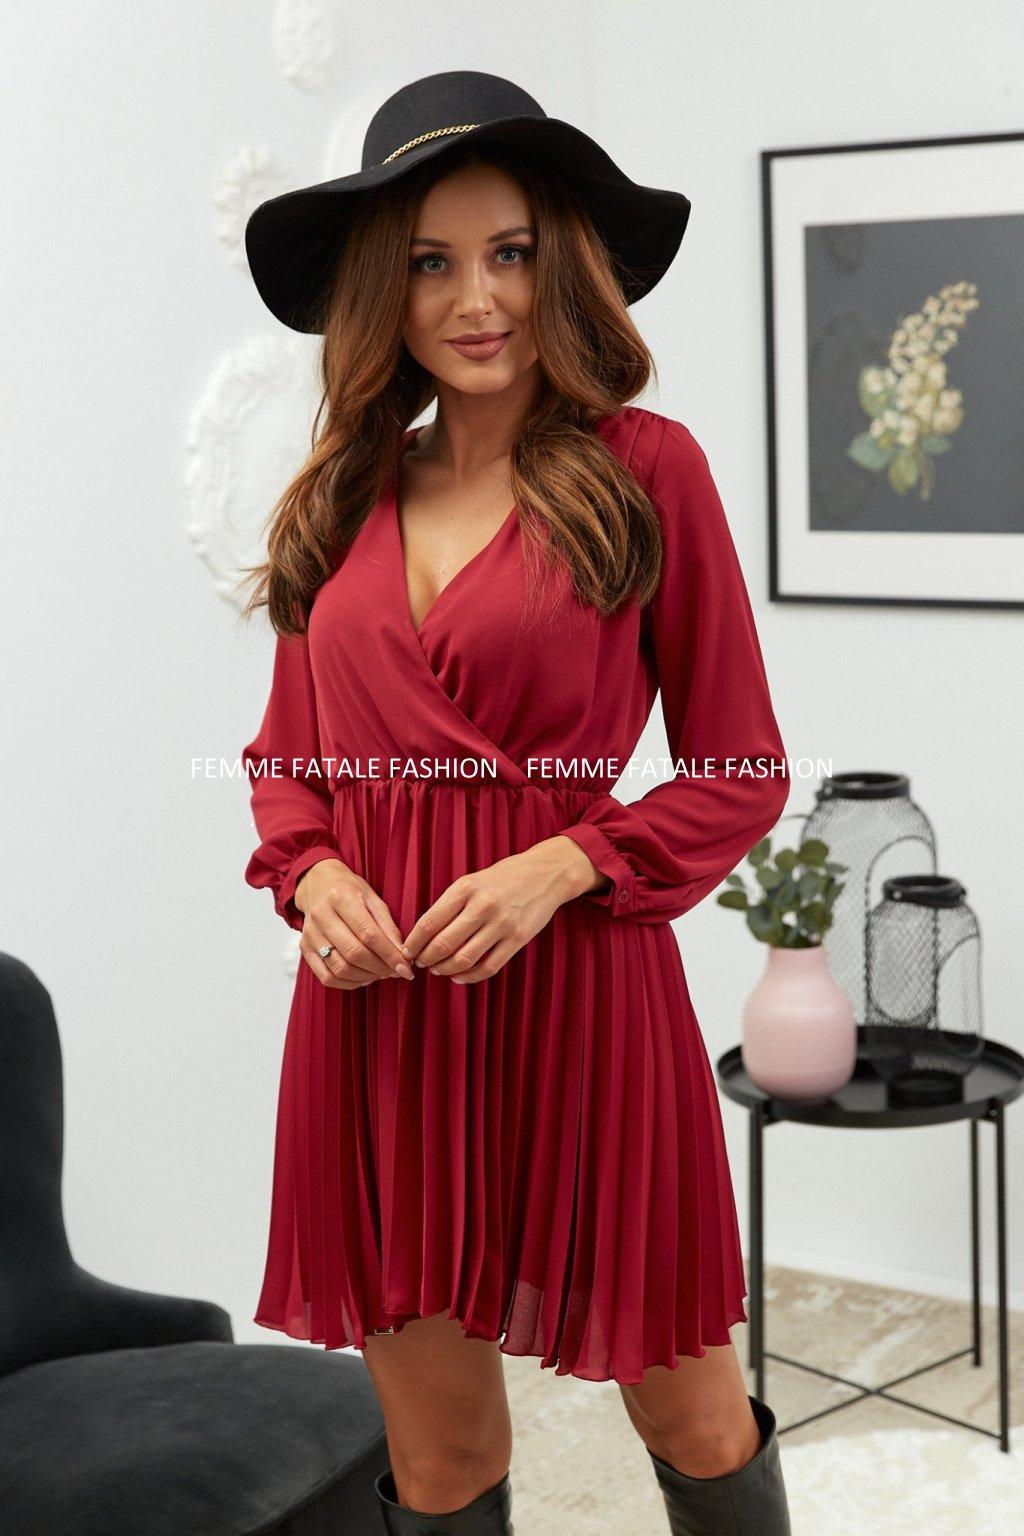 Plísované šaty LELA femmefatalefashion (2)